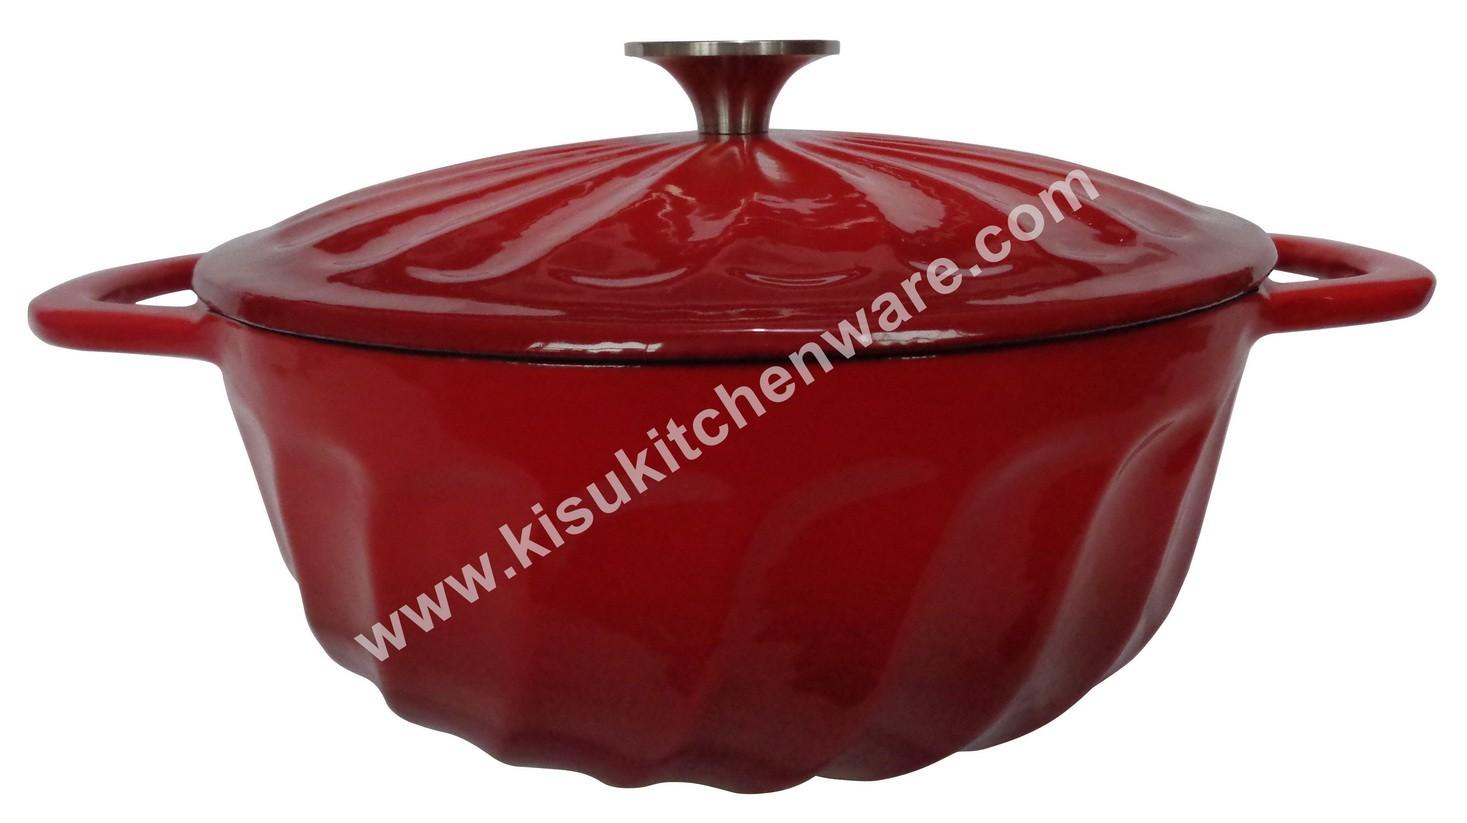 Cast iron round casserole 5A24Q10